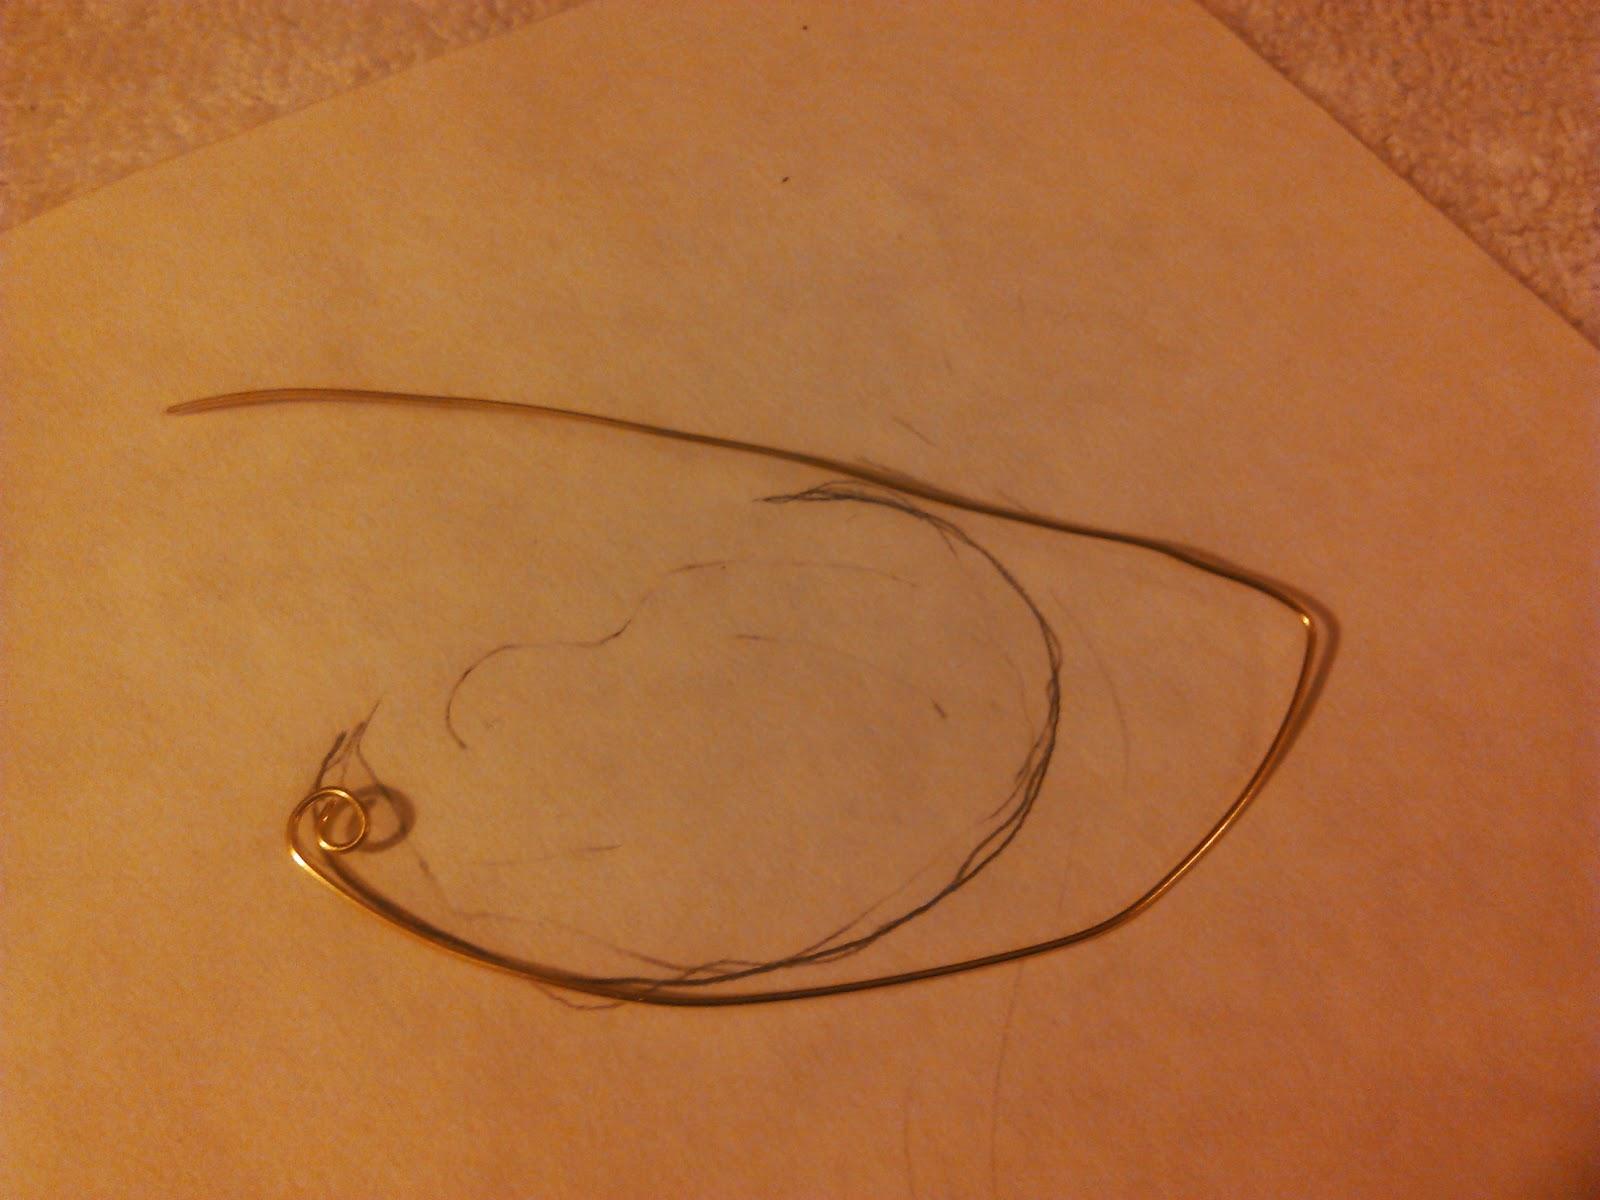 Kitsune Crafts Wire Elf Ears Tutorial Jpg 1600x1200 Fairy Ear Cuff Template